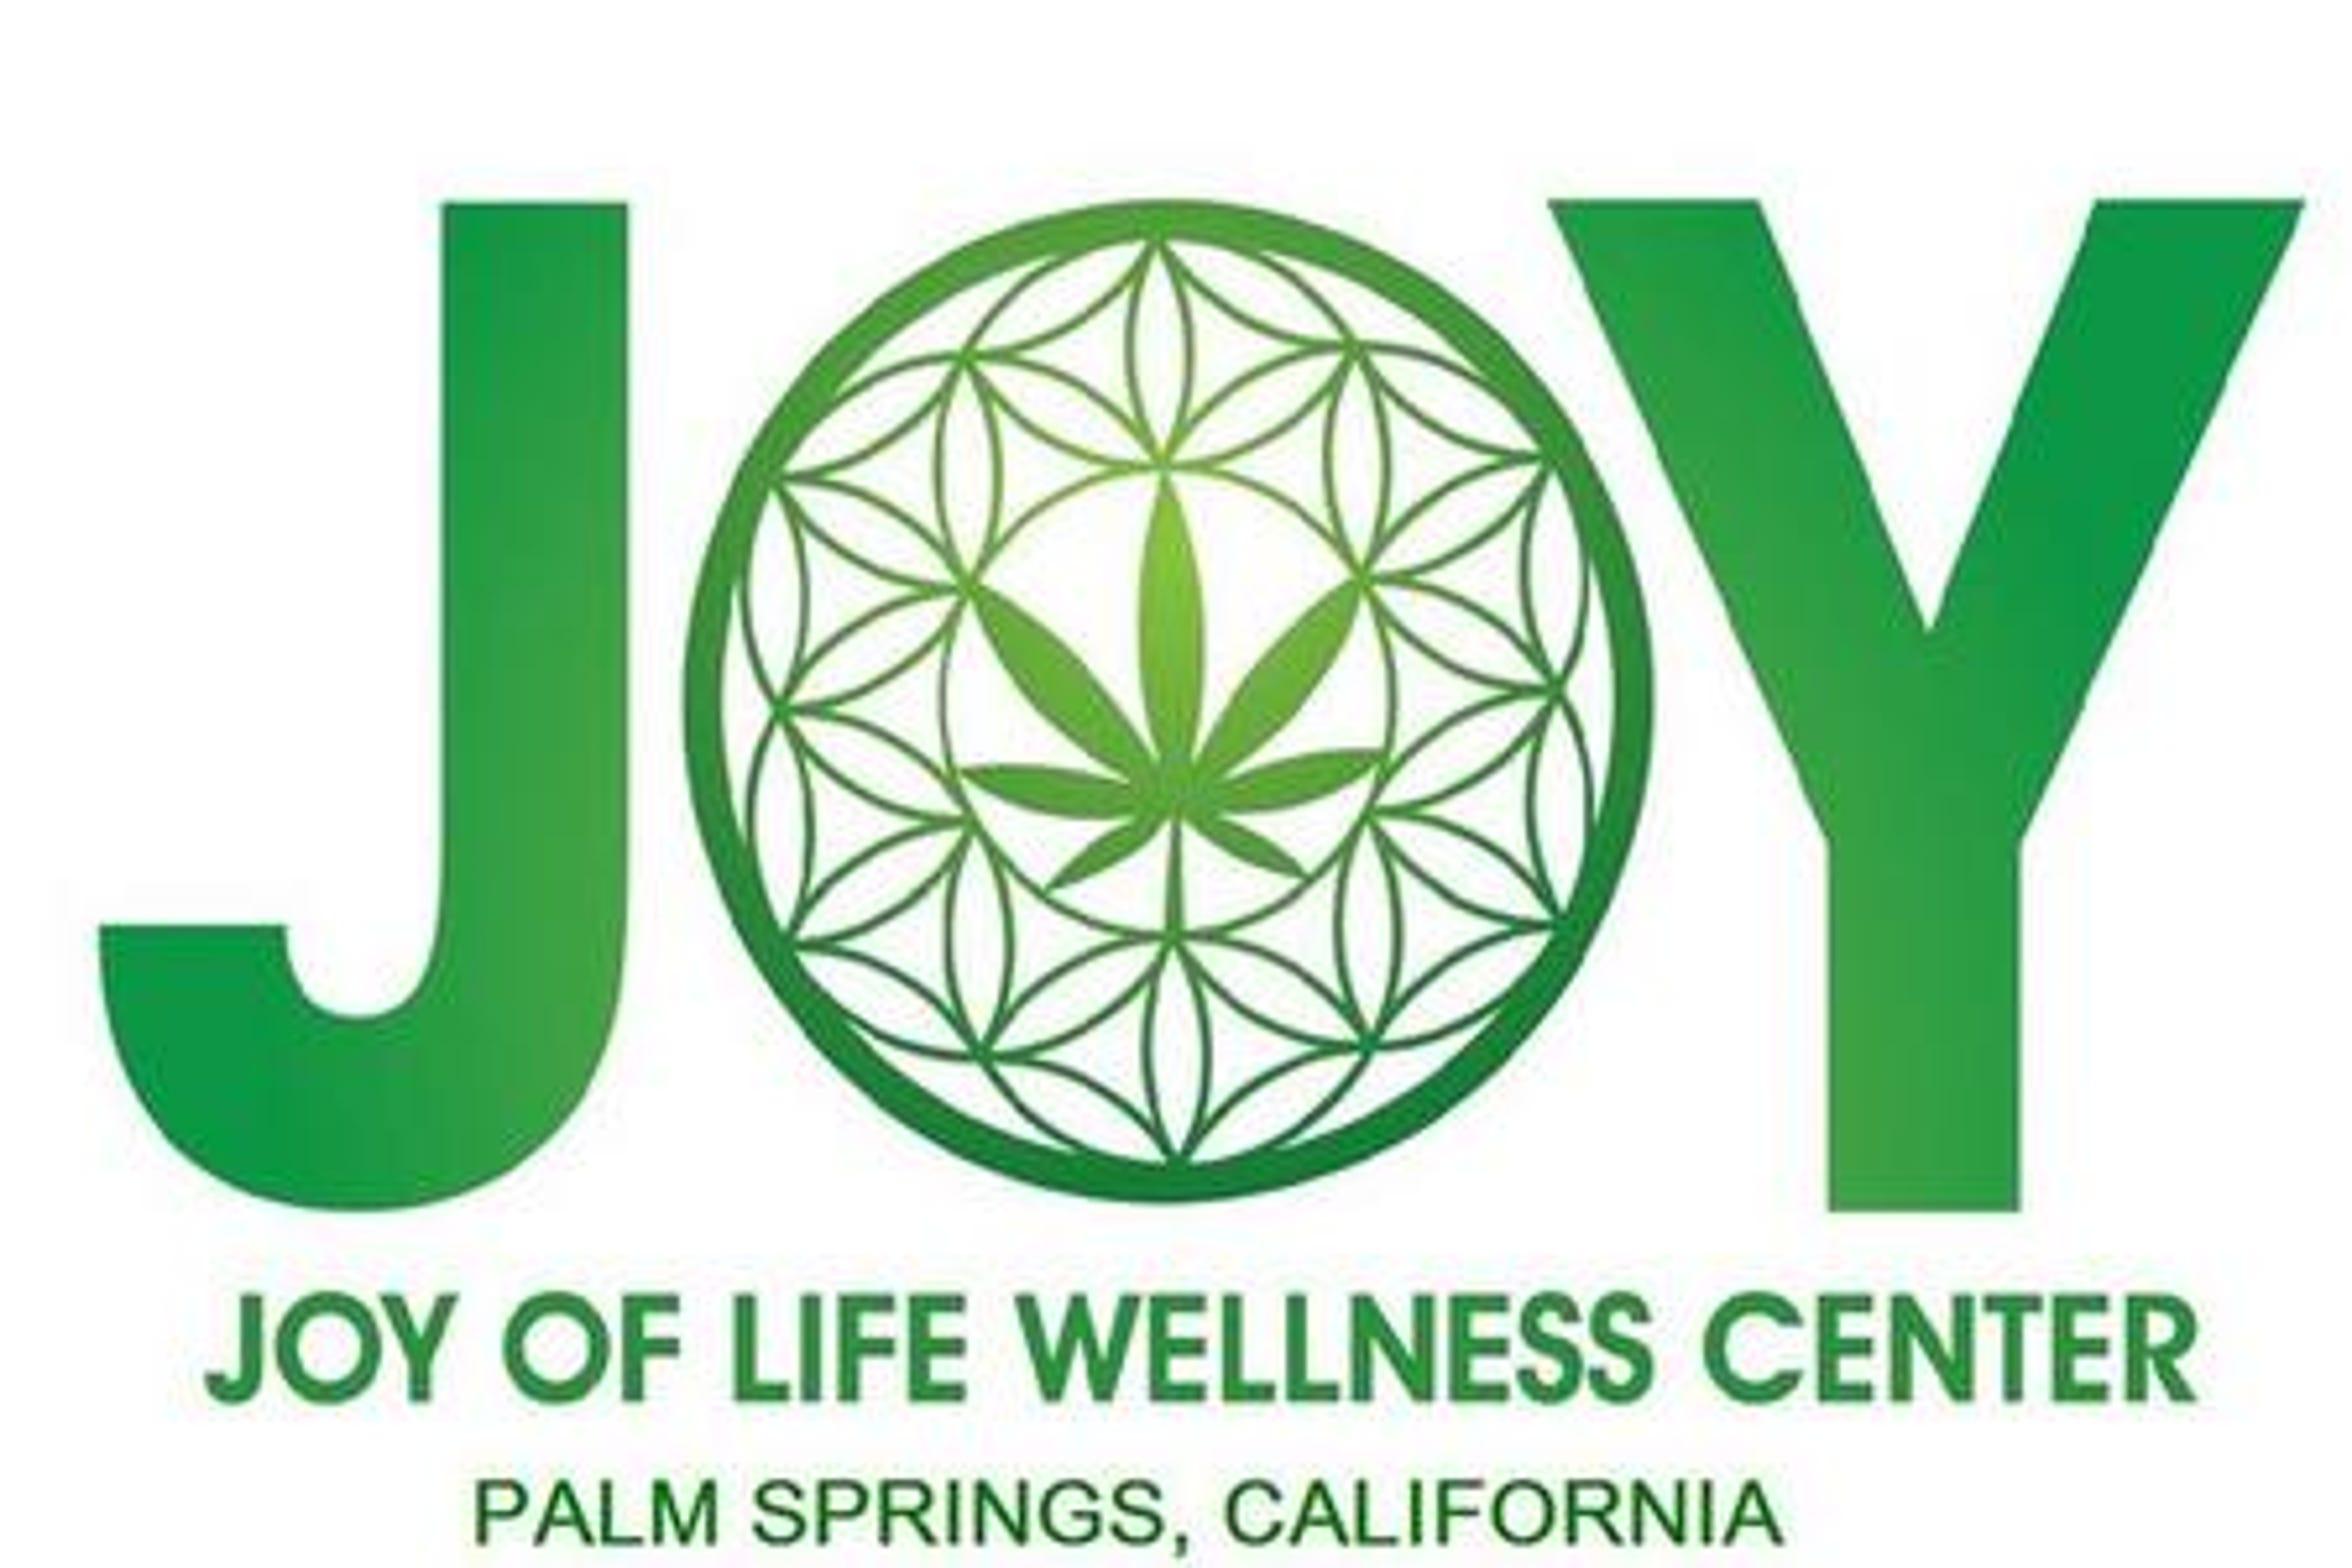 Joy of Life Wellness Center.